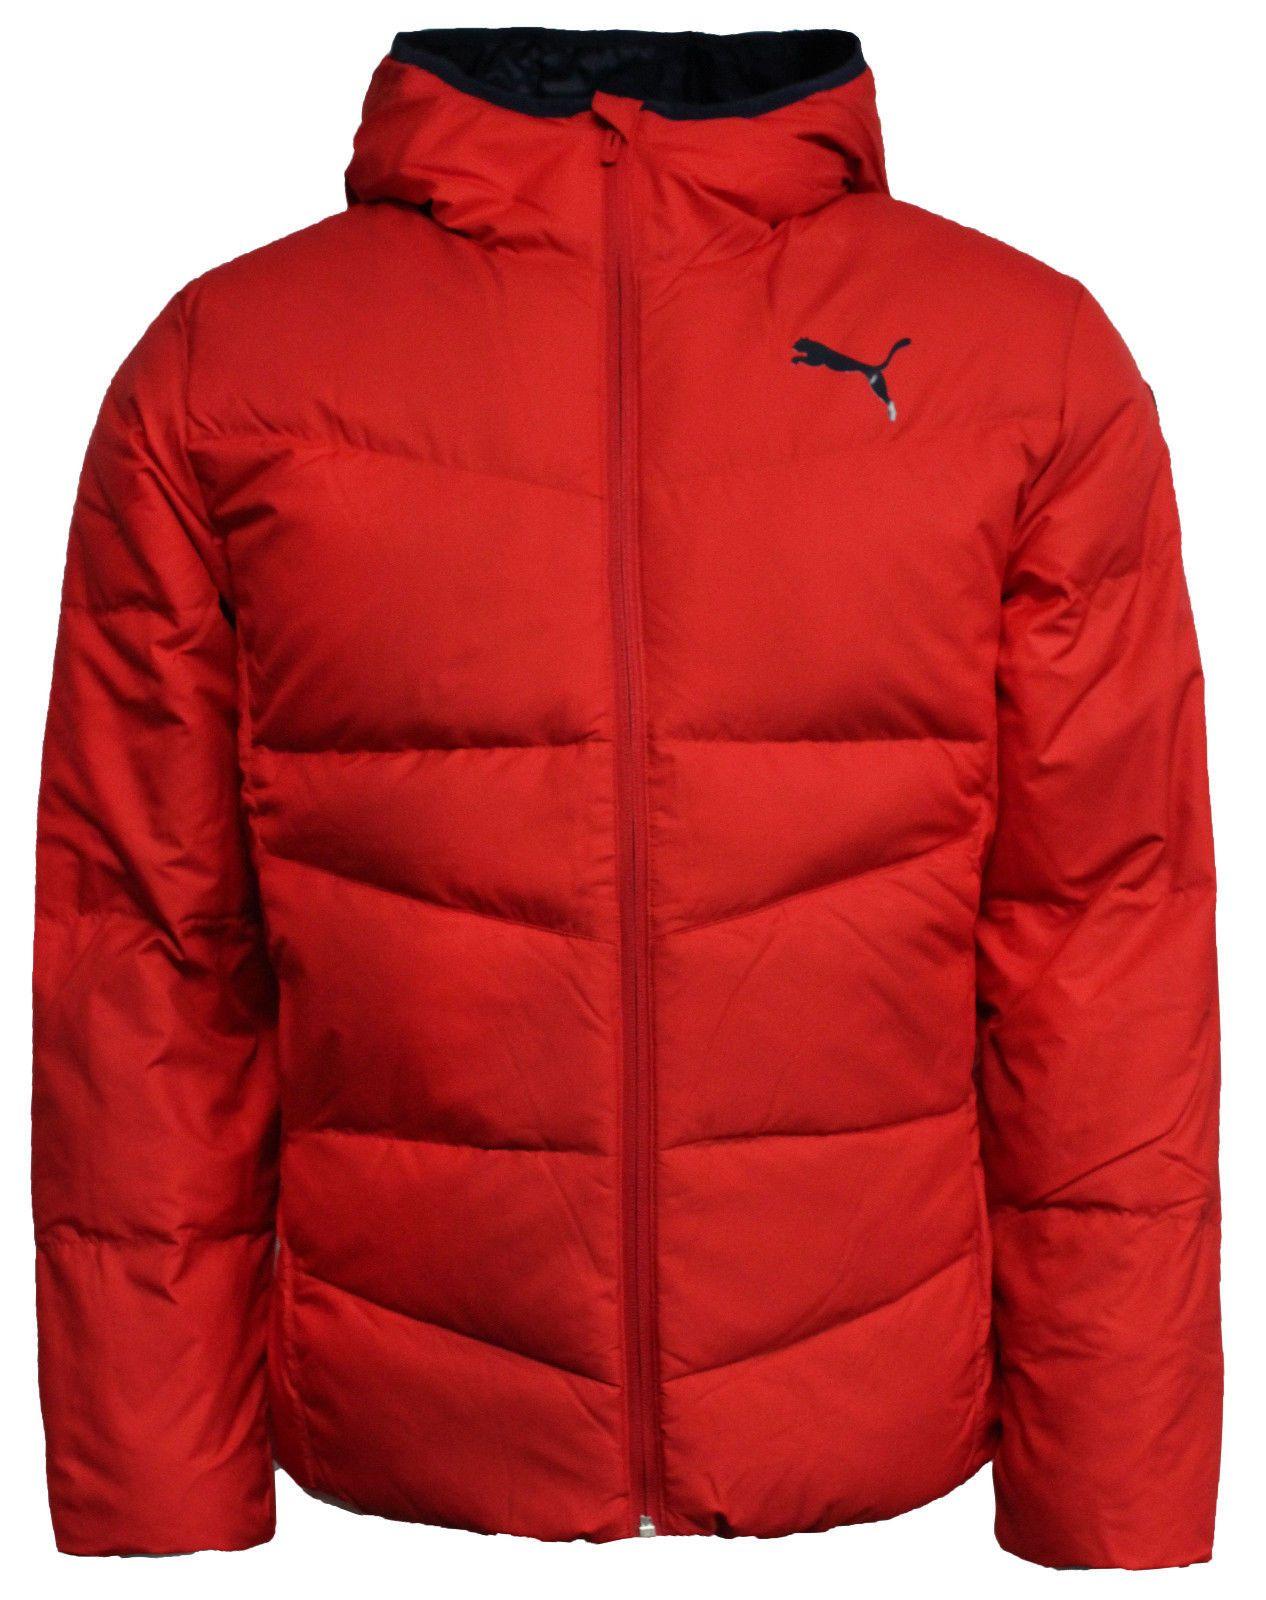 Puma Mens Zip Up Hooded Red Jacket Down Filled Puffer Coat 838642 09 M16 Tech Fleece Hoodie Red Jacket Men S Coats Jackets [ 1600 x 1266 Pixel ]